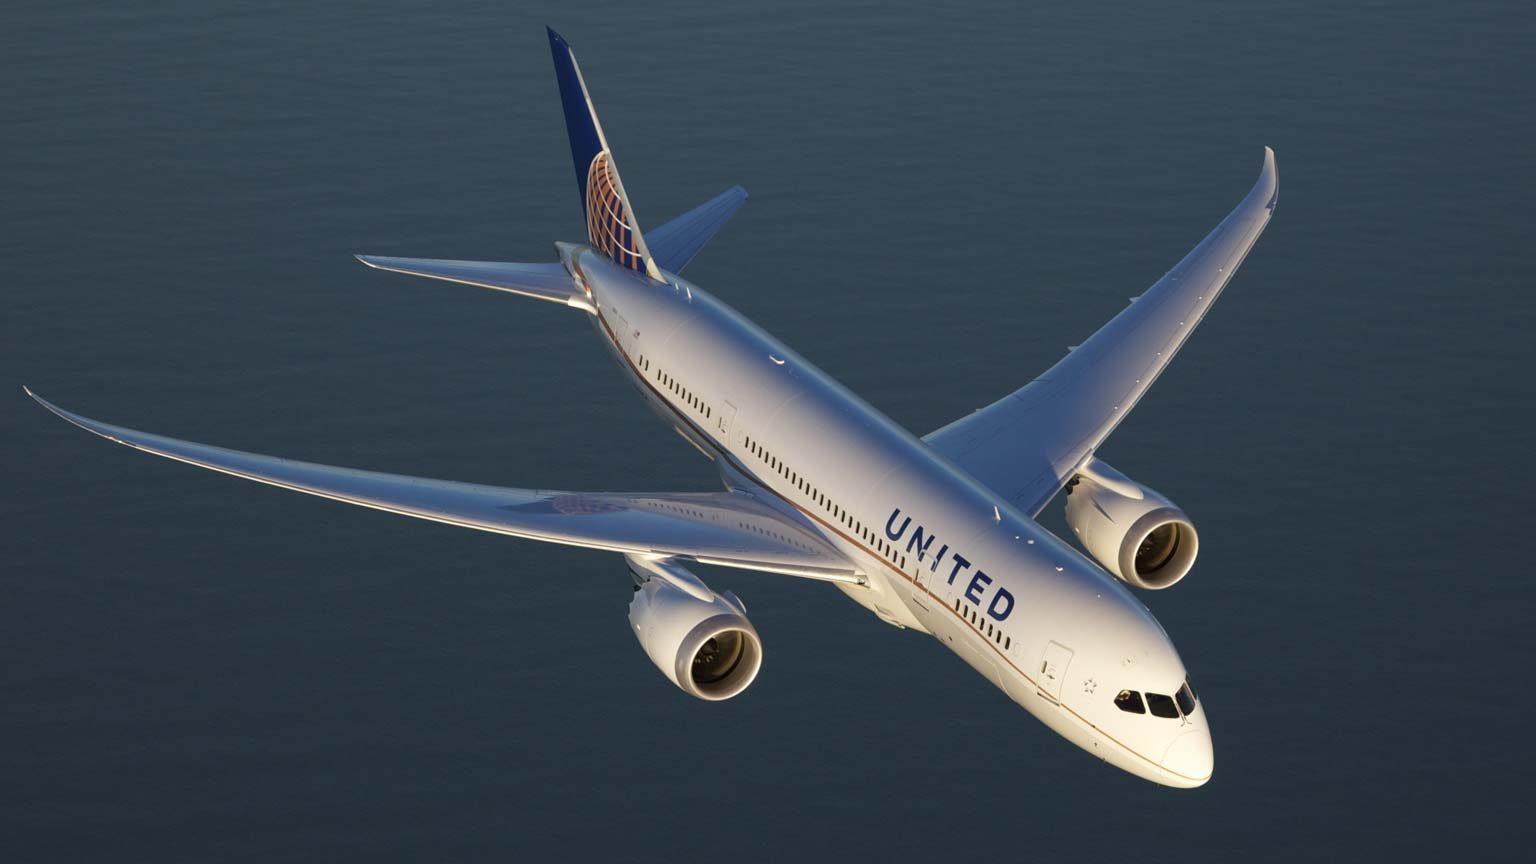 United Airlines Mileage Plus Masthead Image